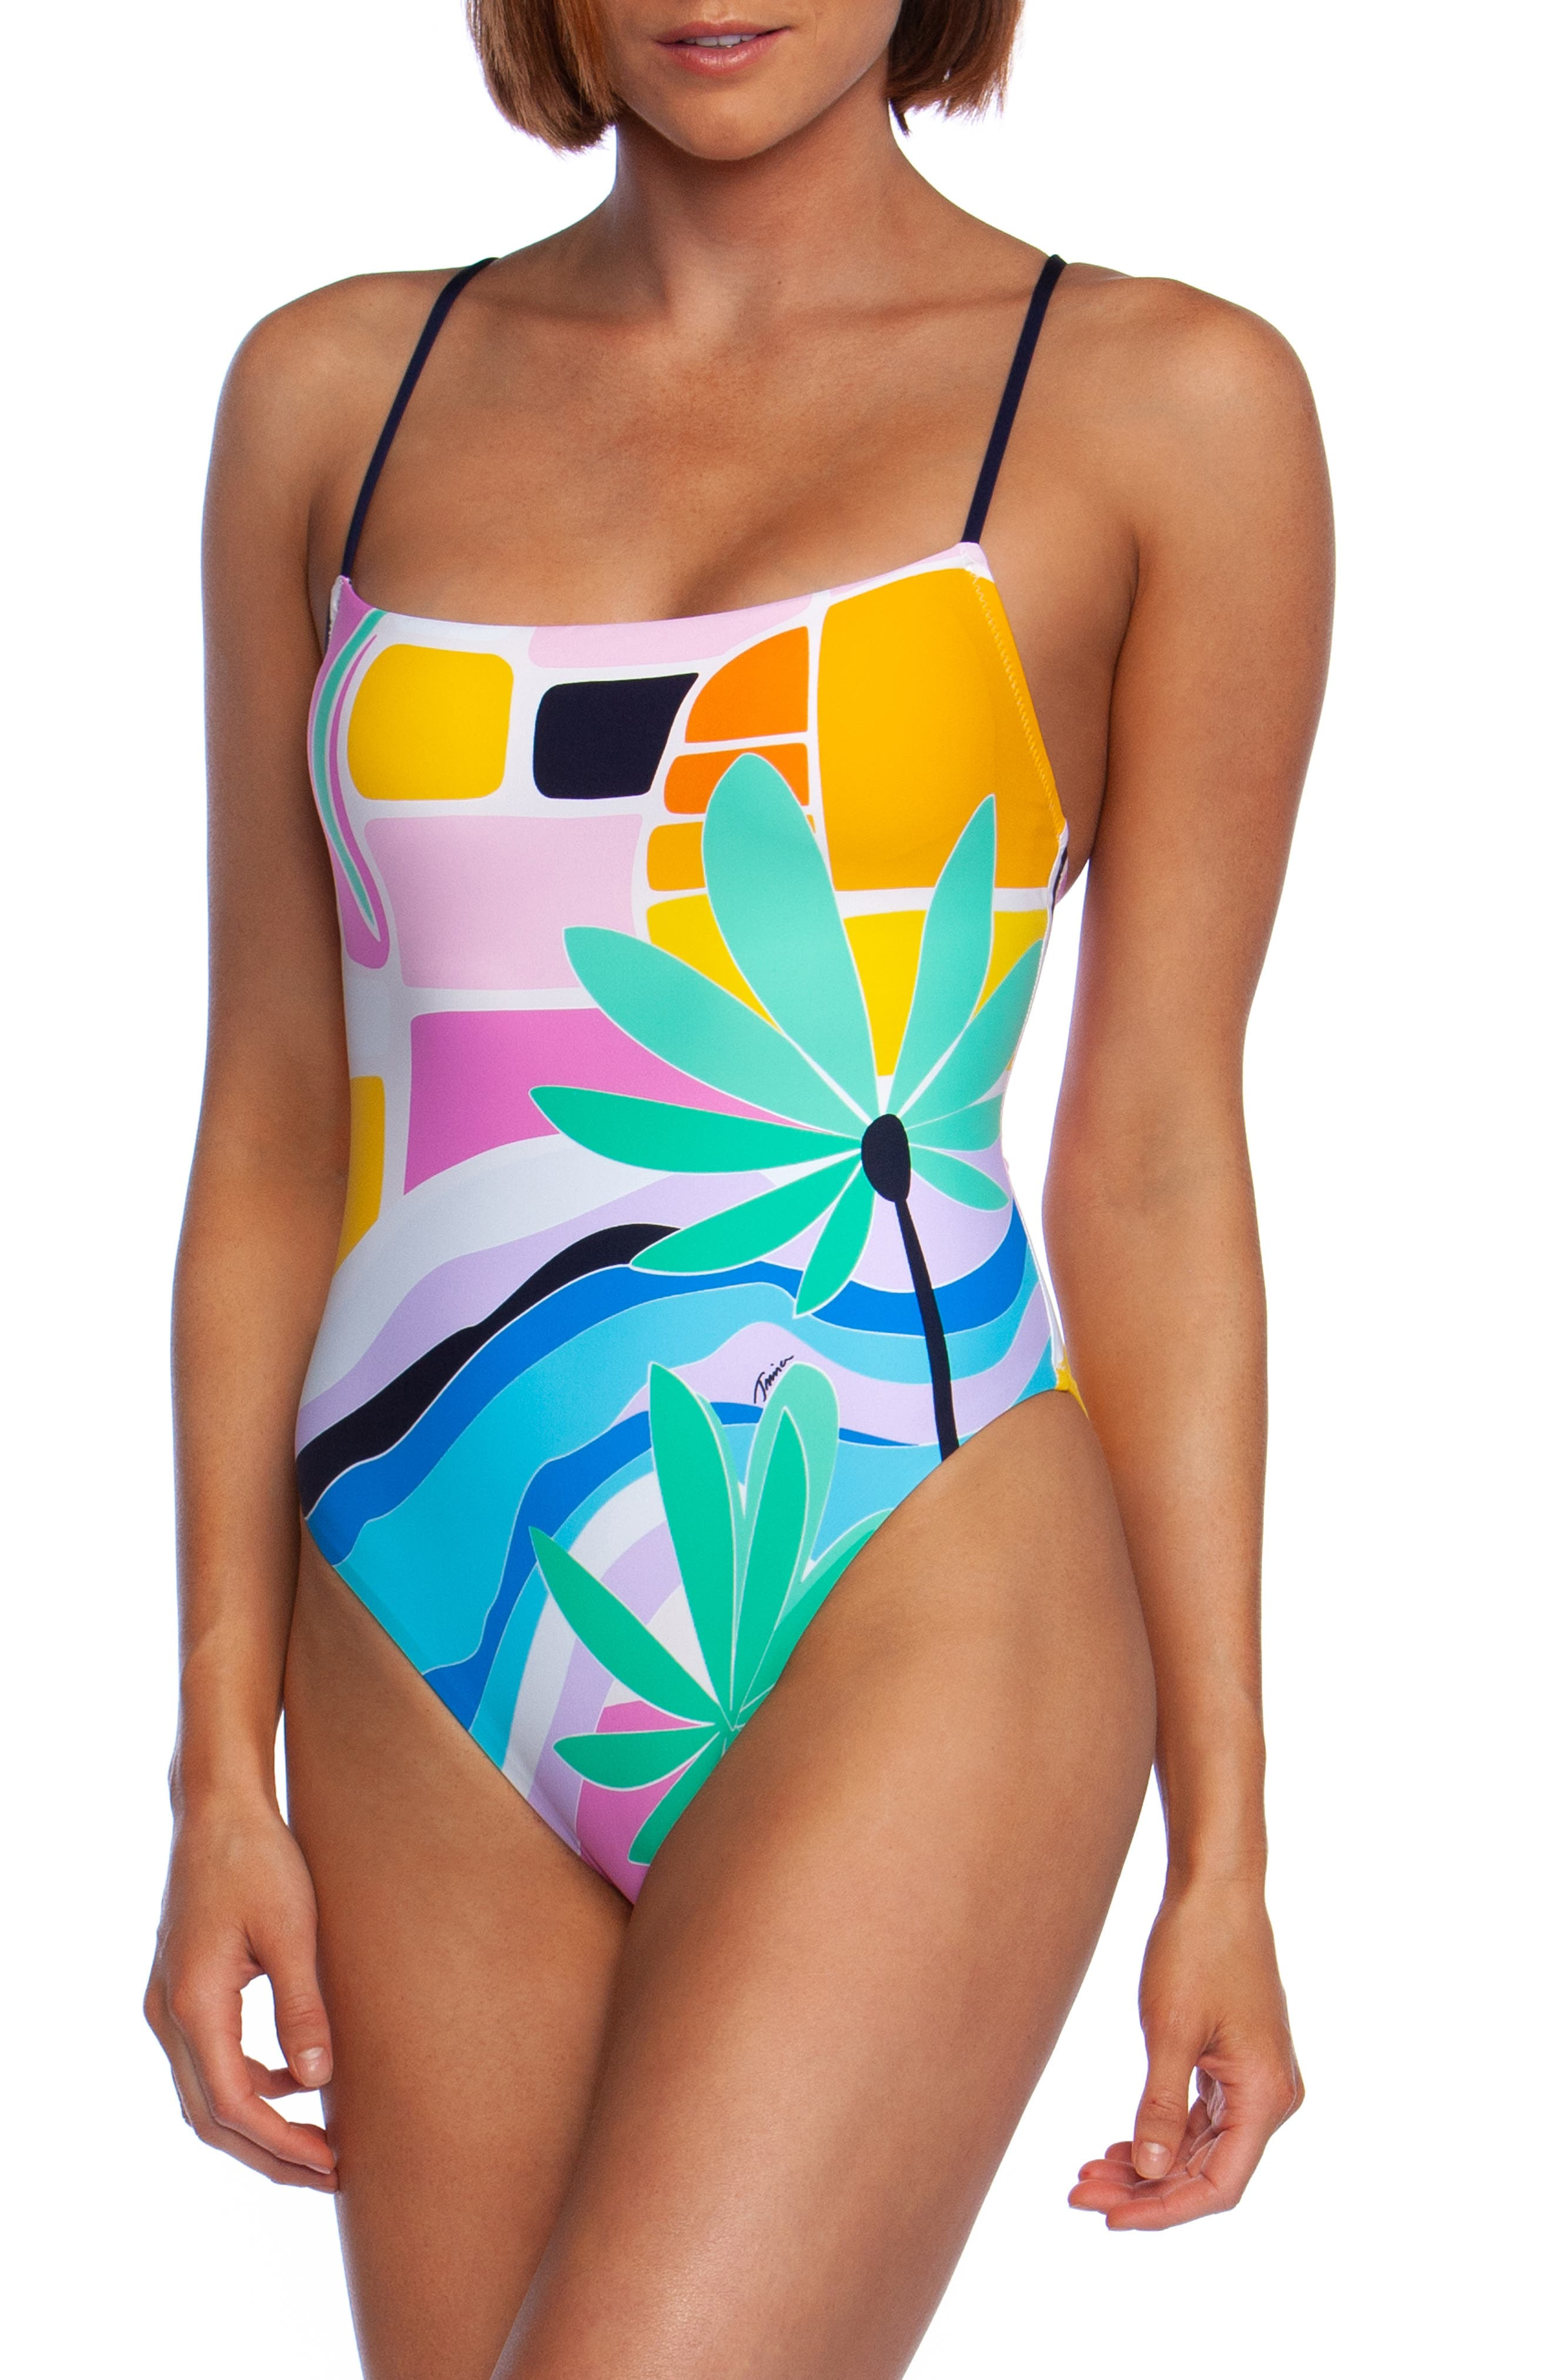 Trina Turk Mosaic Sunrise Mio One-Piece Swimsuit, Pink